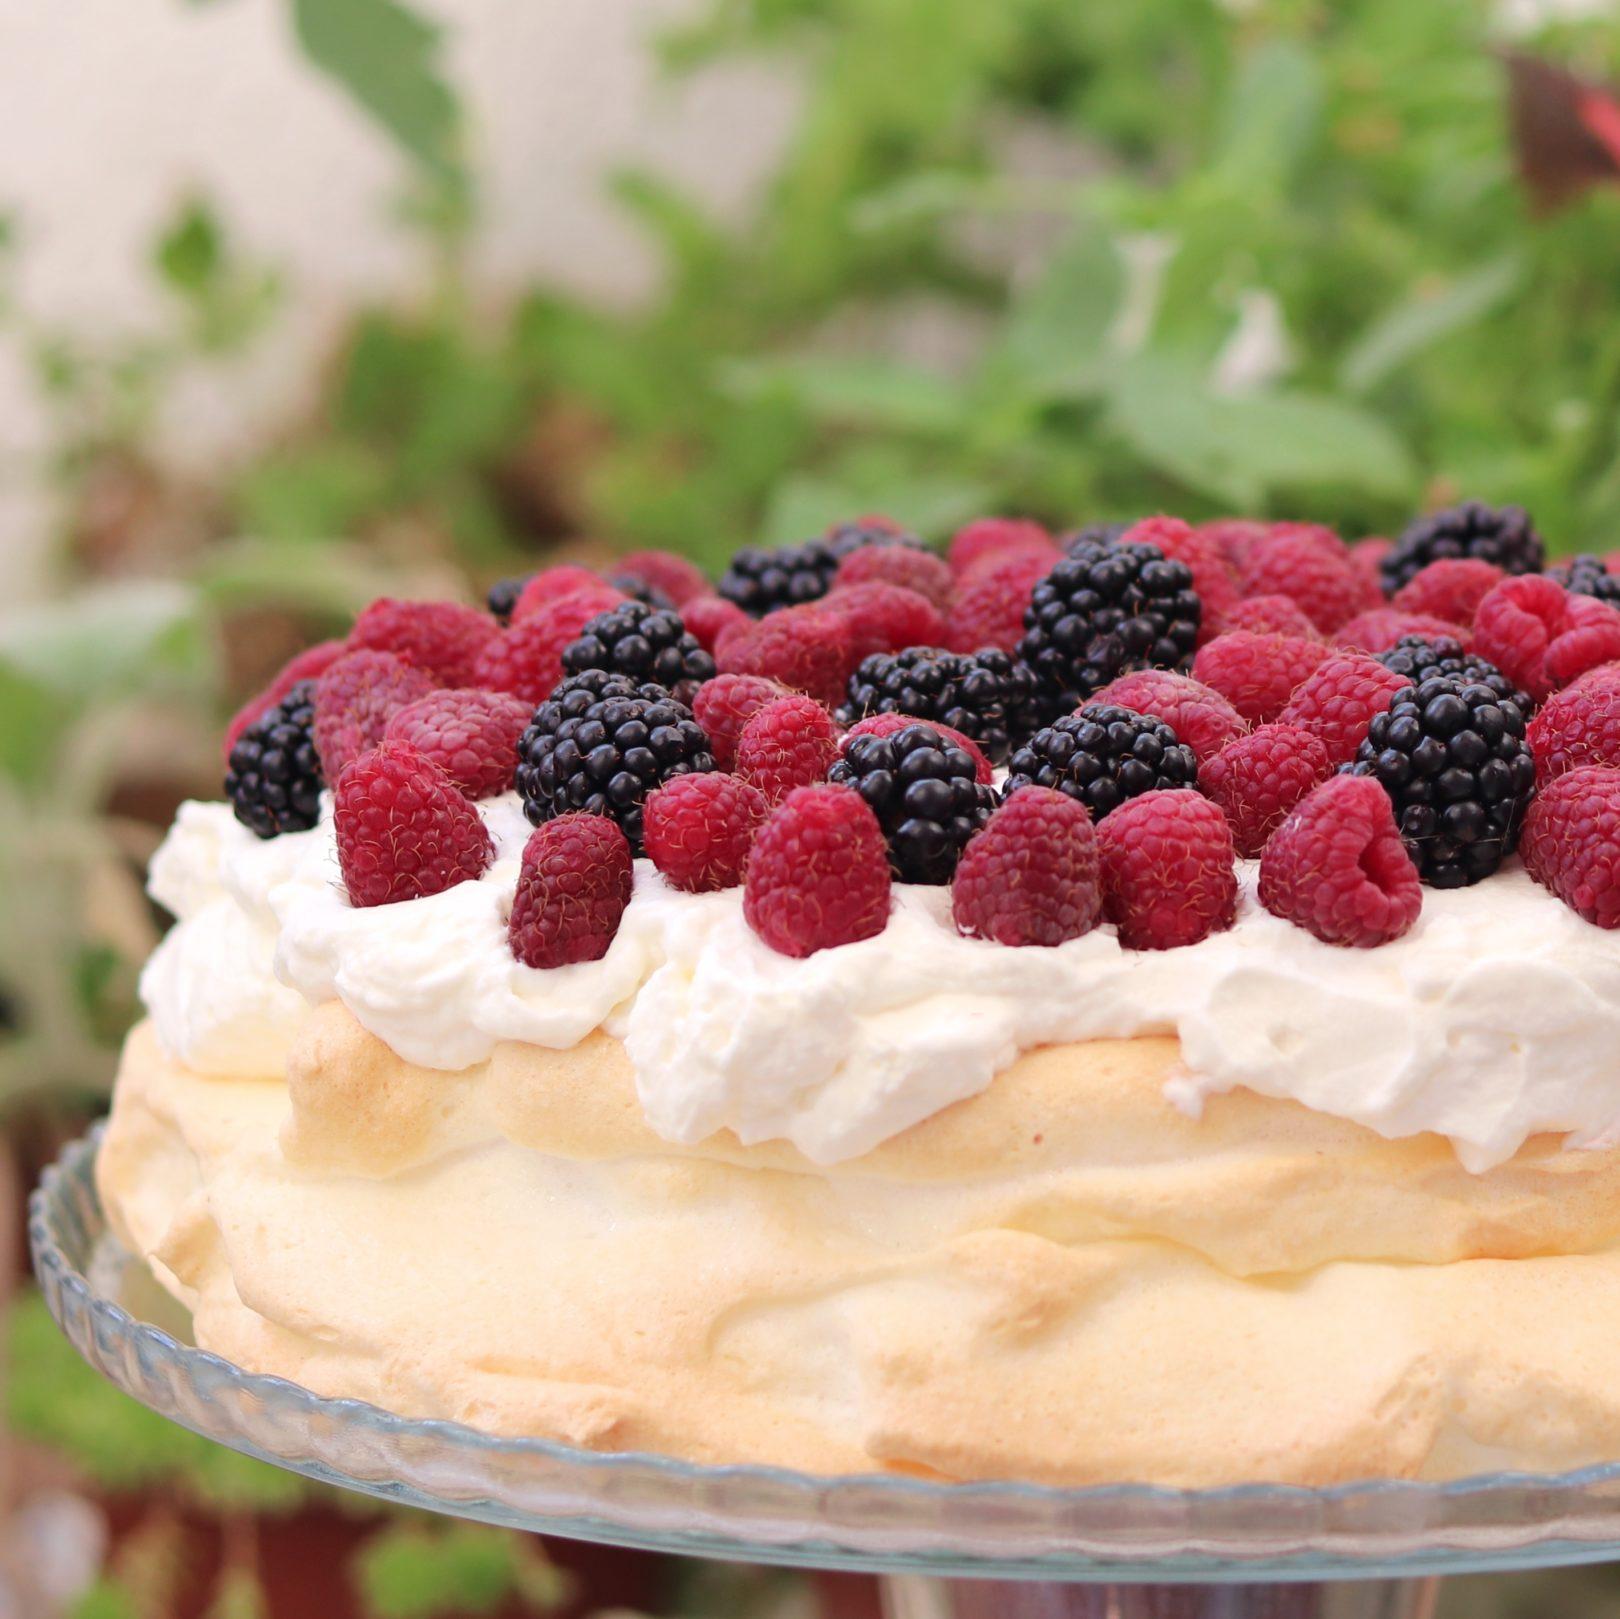 Keto Pavlova with Berries